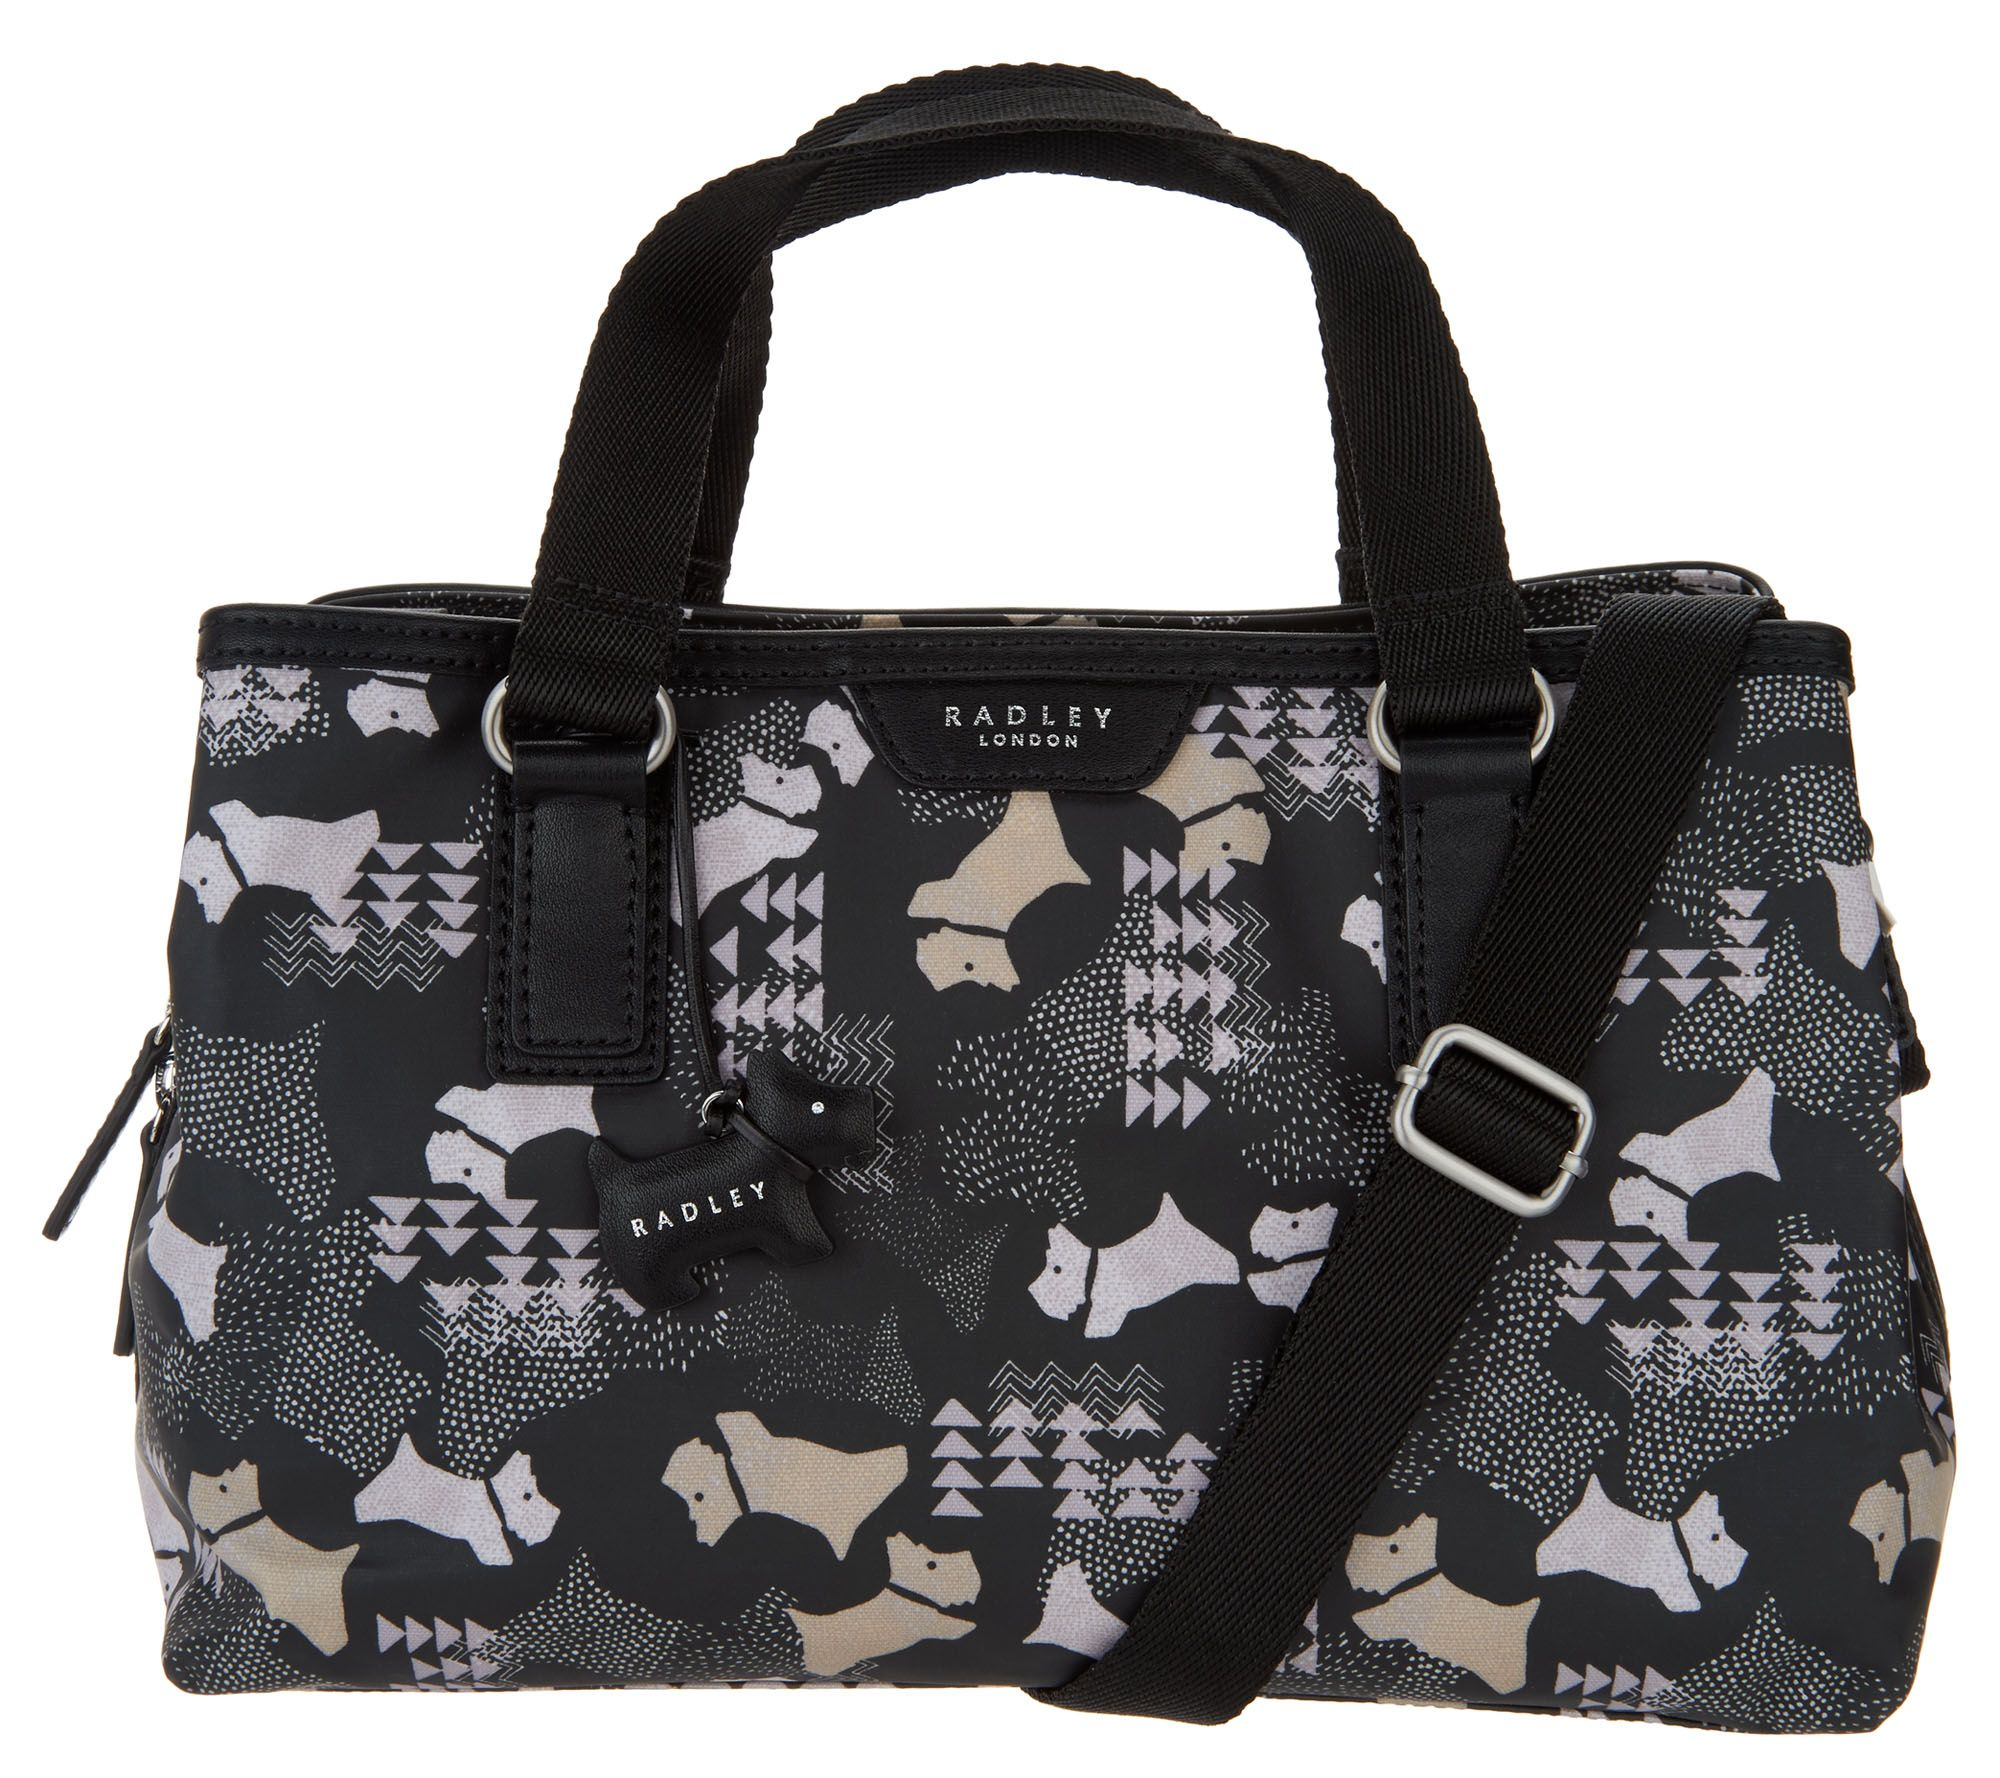 442bc810ba RADLEY London Data Dog Medium Satchel Handbag - Page 1 — QVC.com